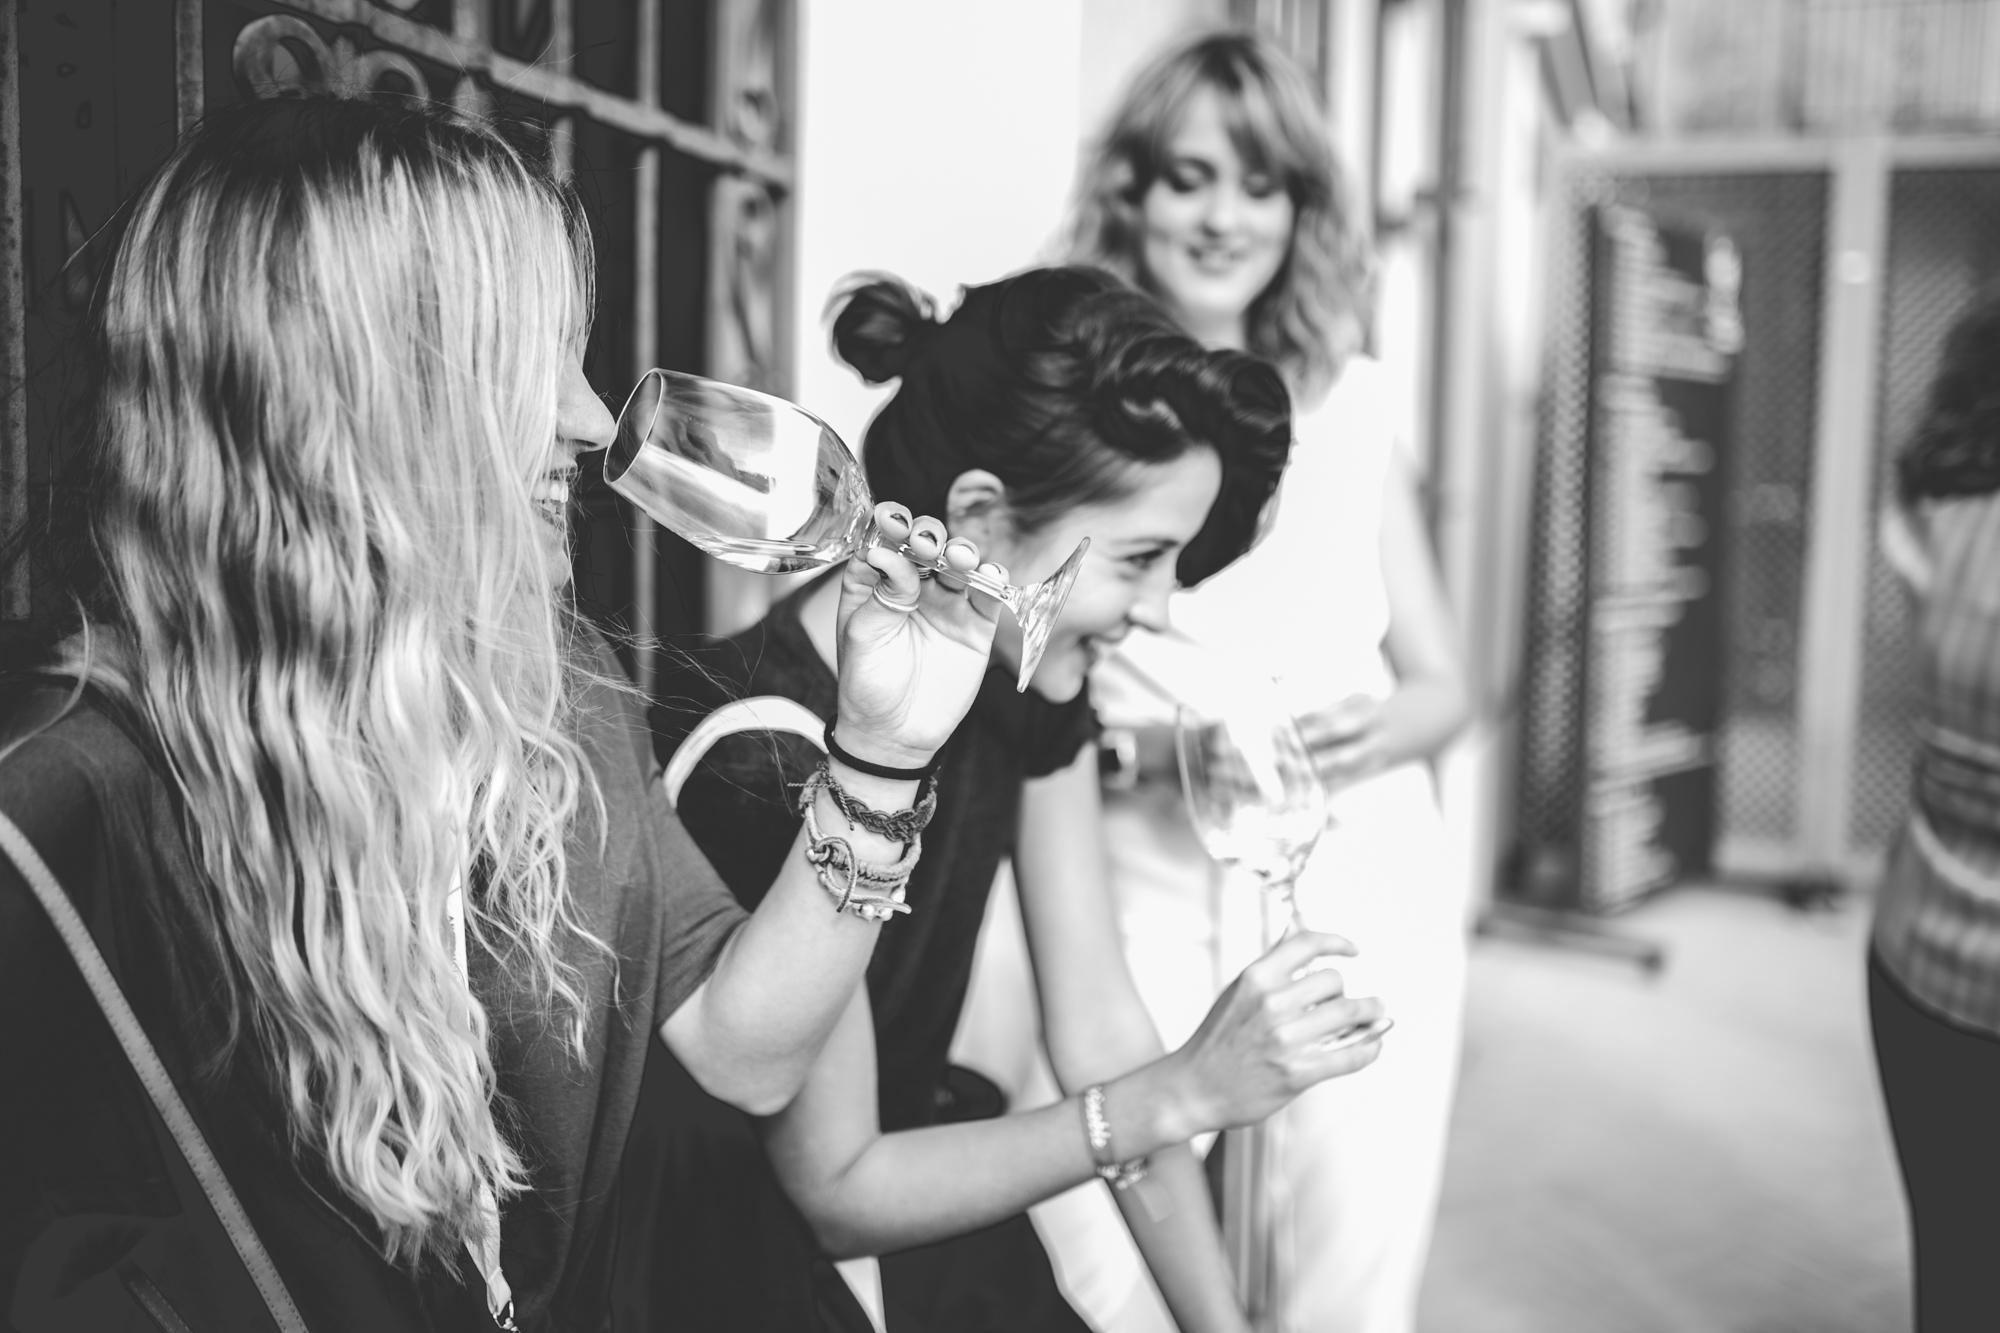 Girls with Wine mood shot